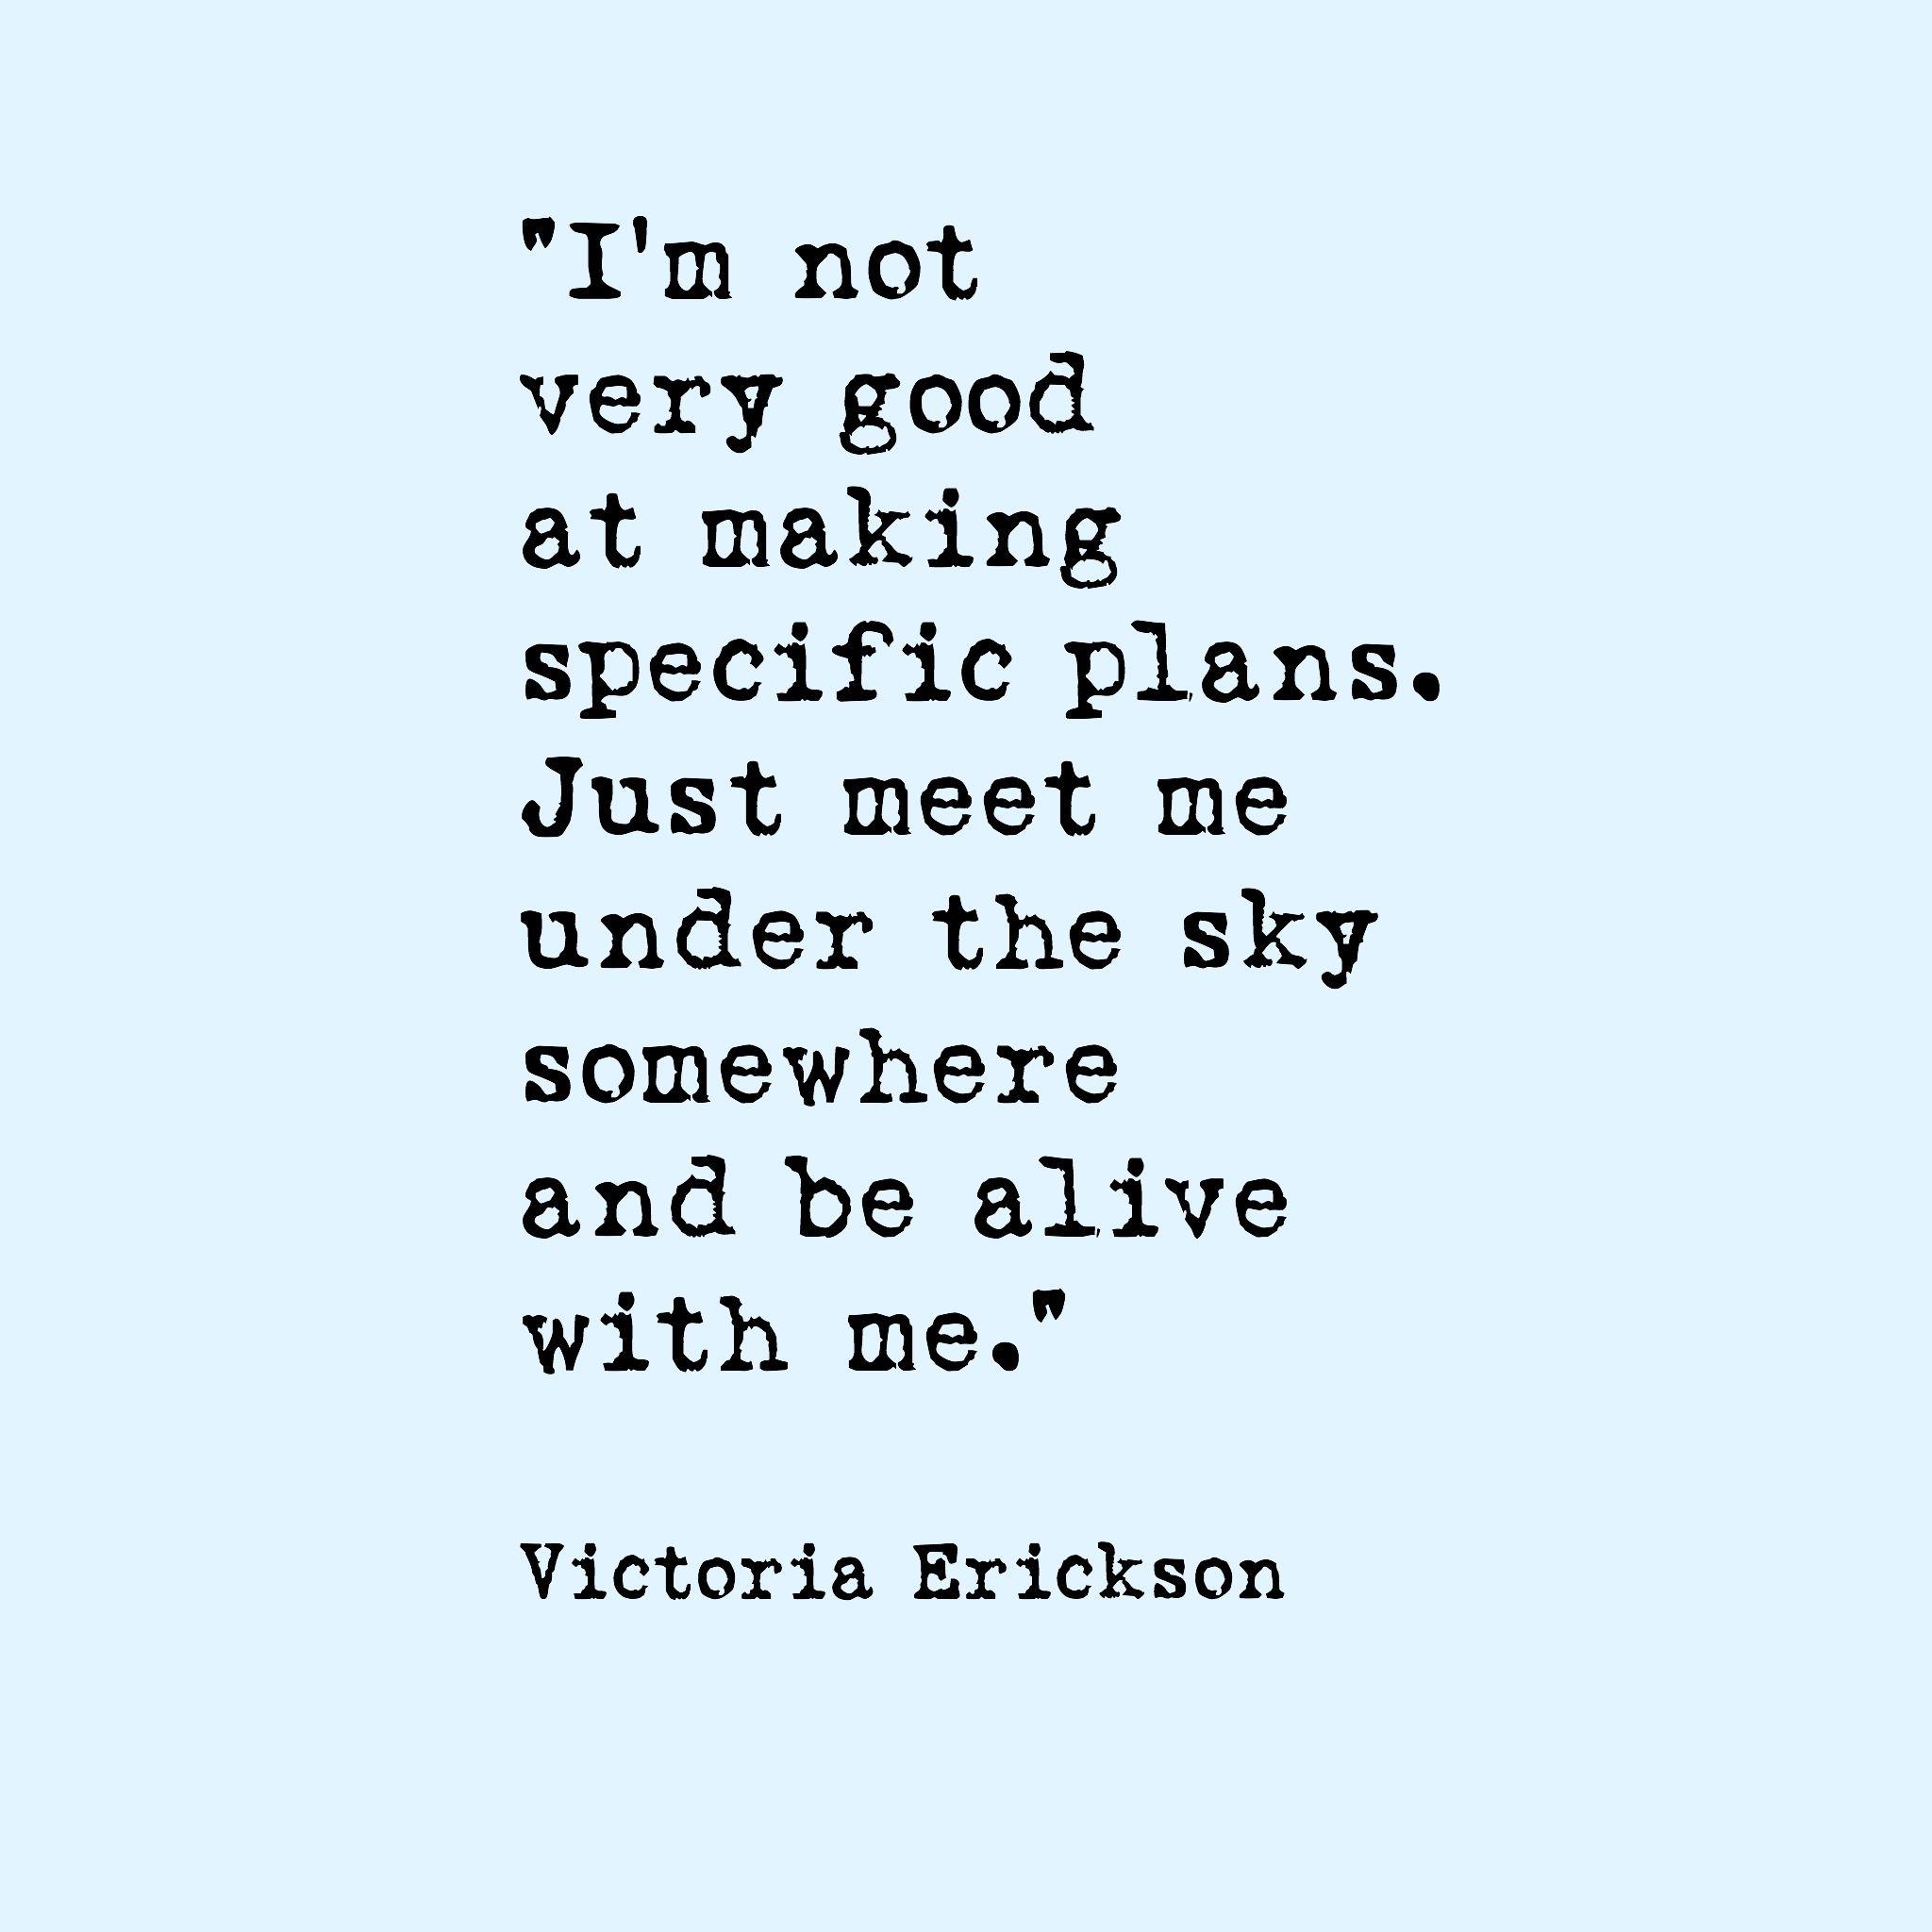 Quotable Quotes About Life Victoria Erickson Instagram Victoriaericksonwriter  Words Of